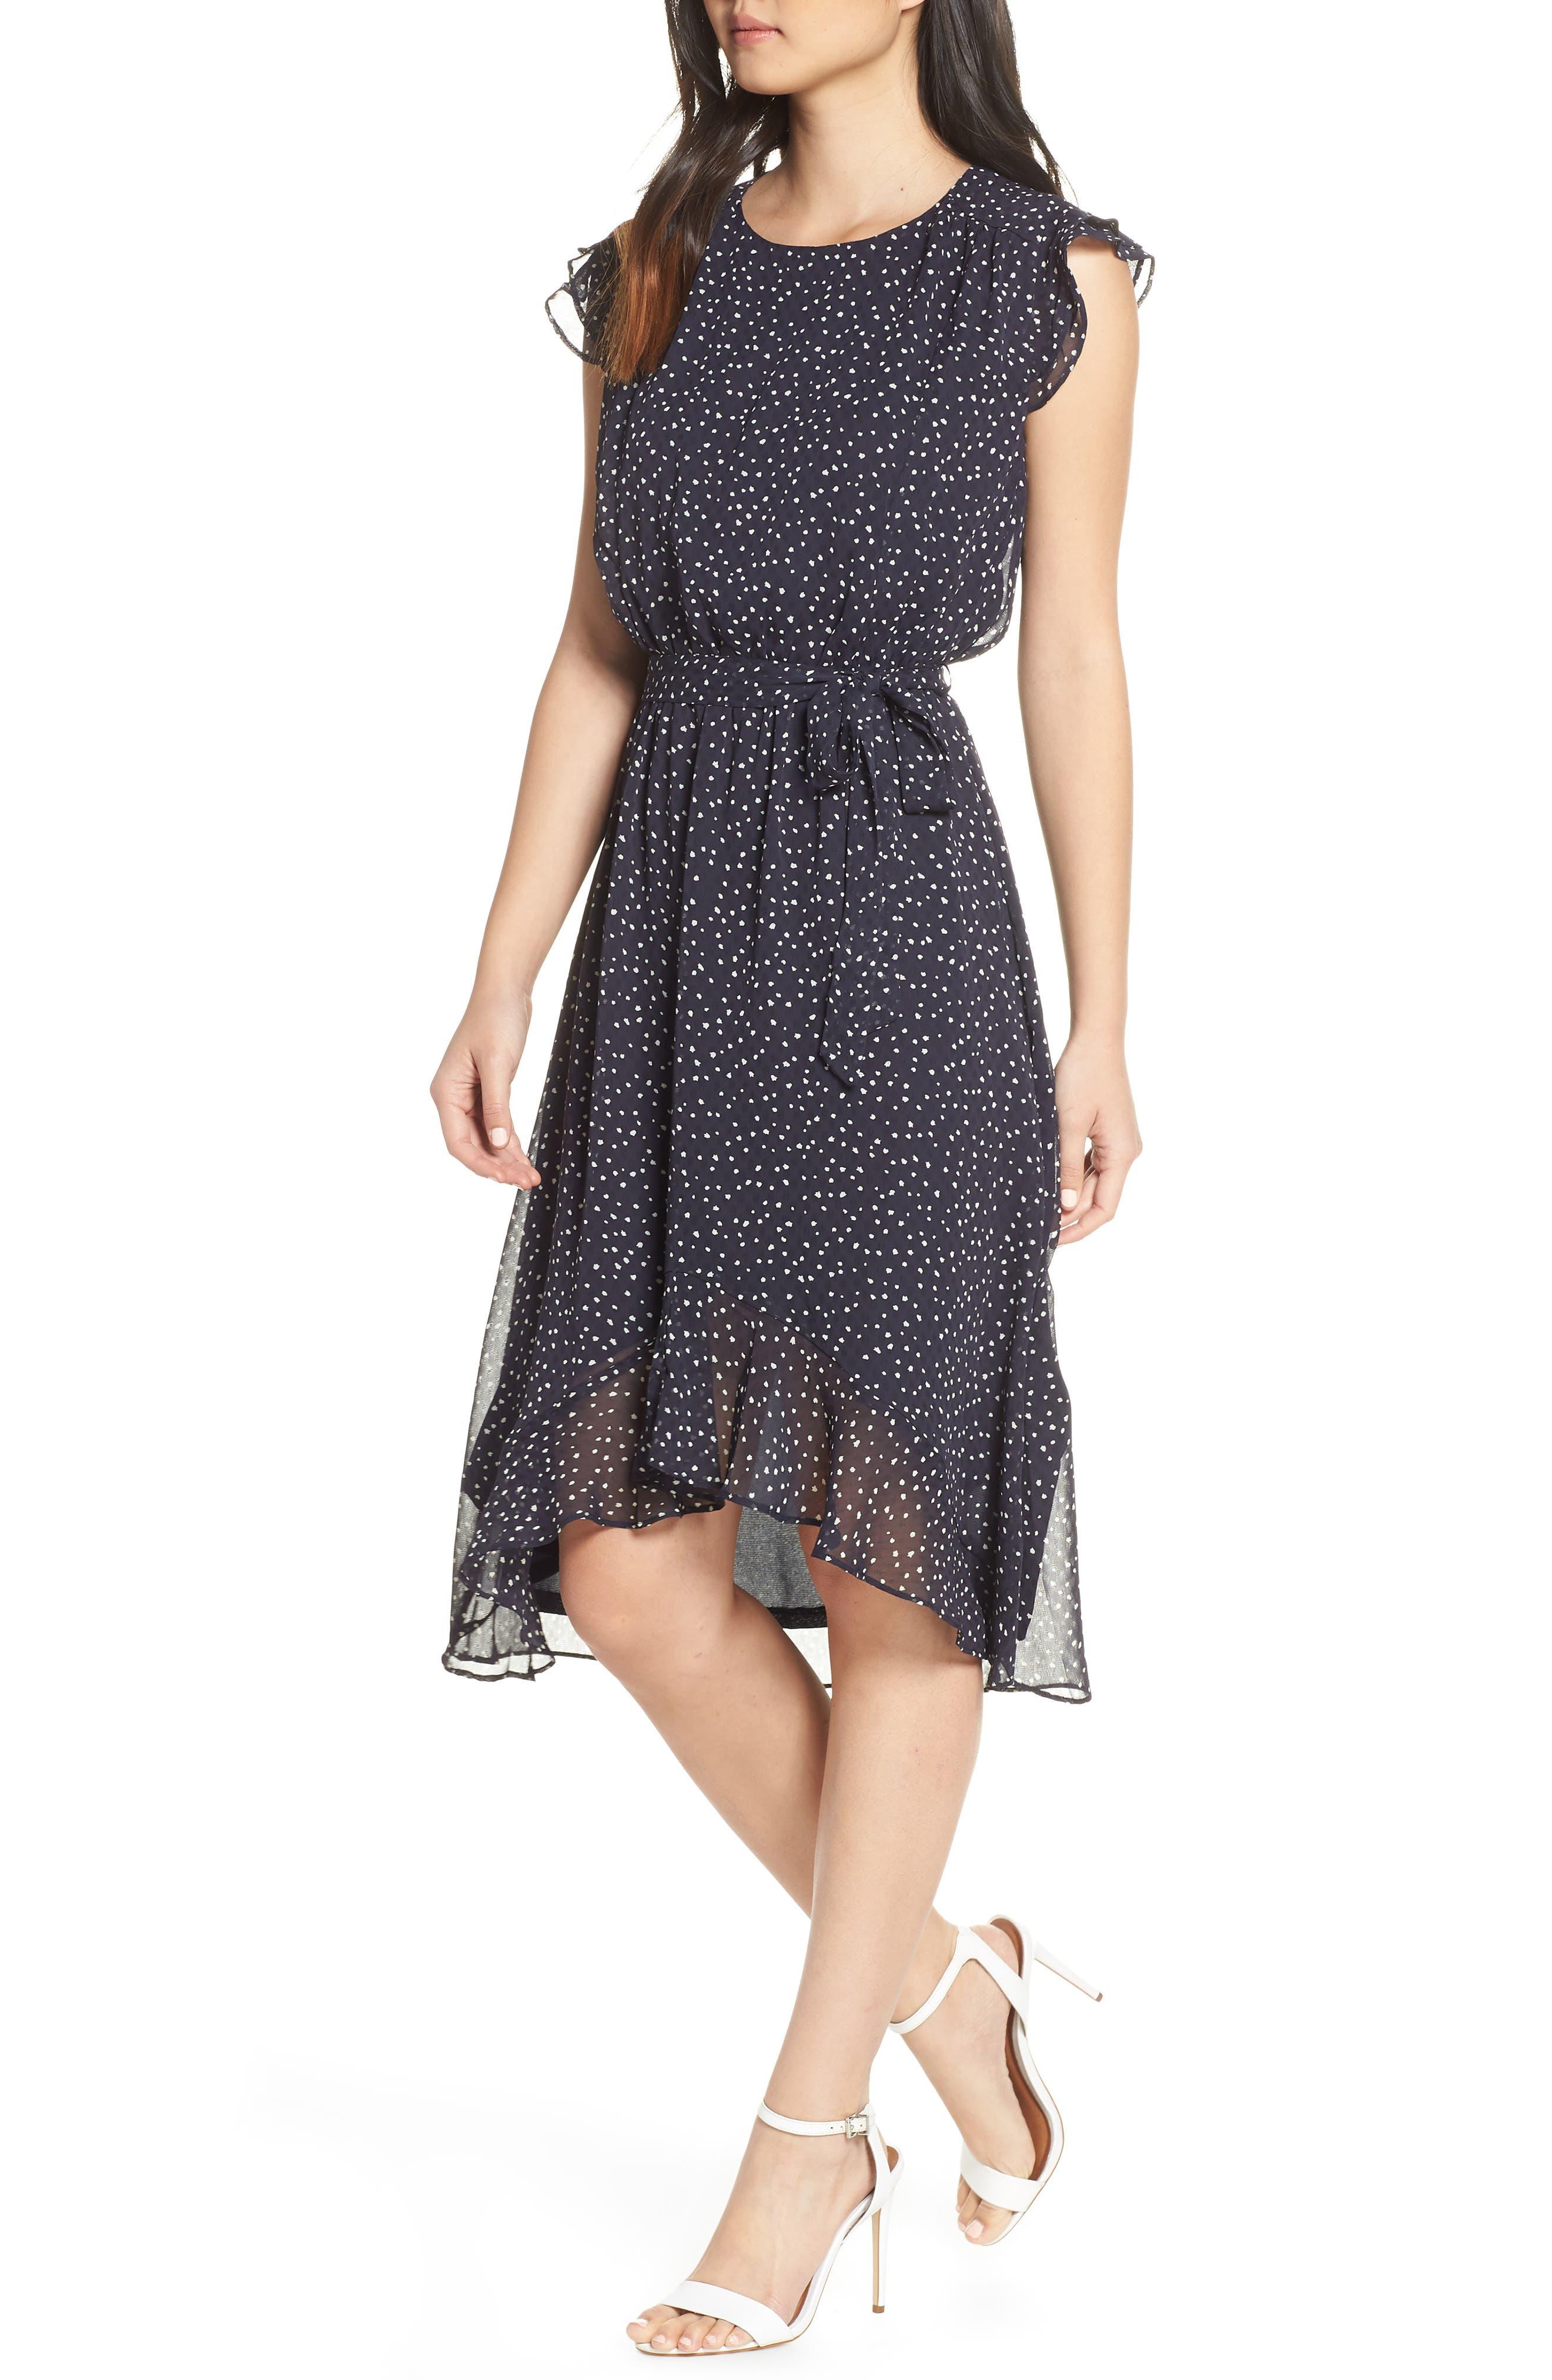 19 COOPER Polka Dot Ruffle Sleeve Chiffon Dress, Main, color, 400